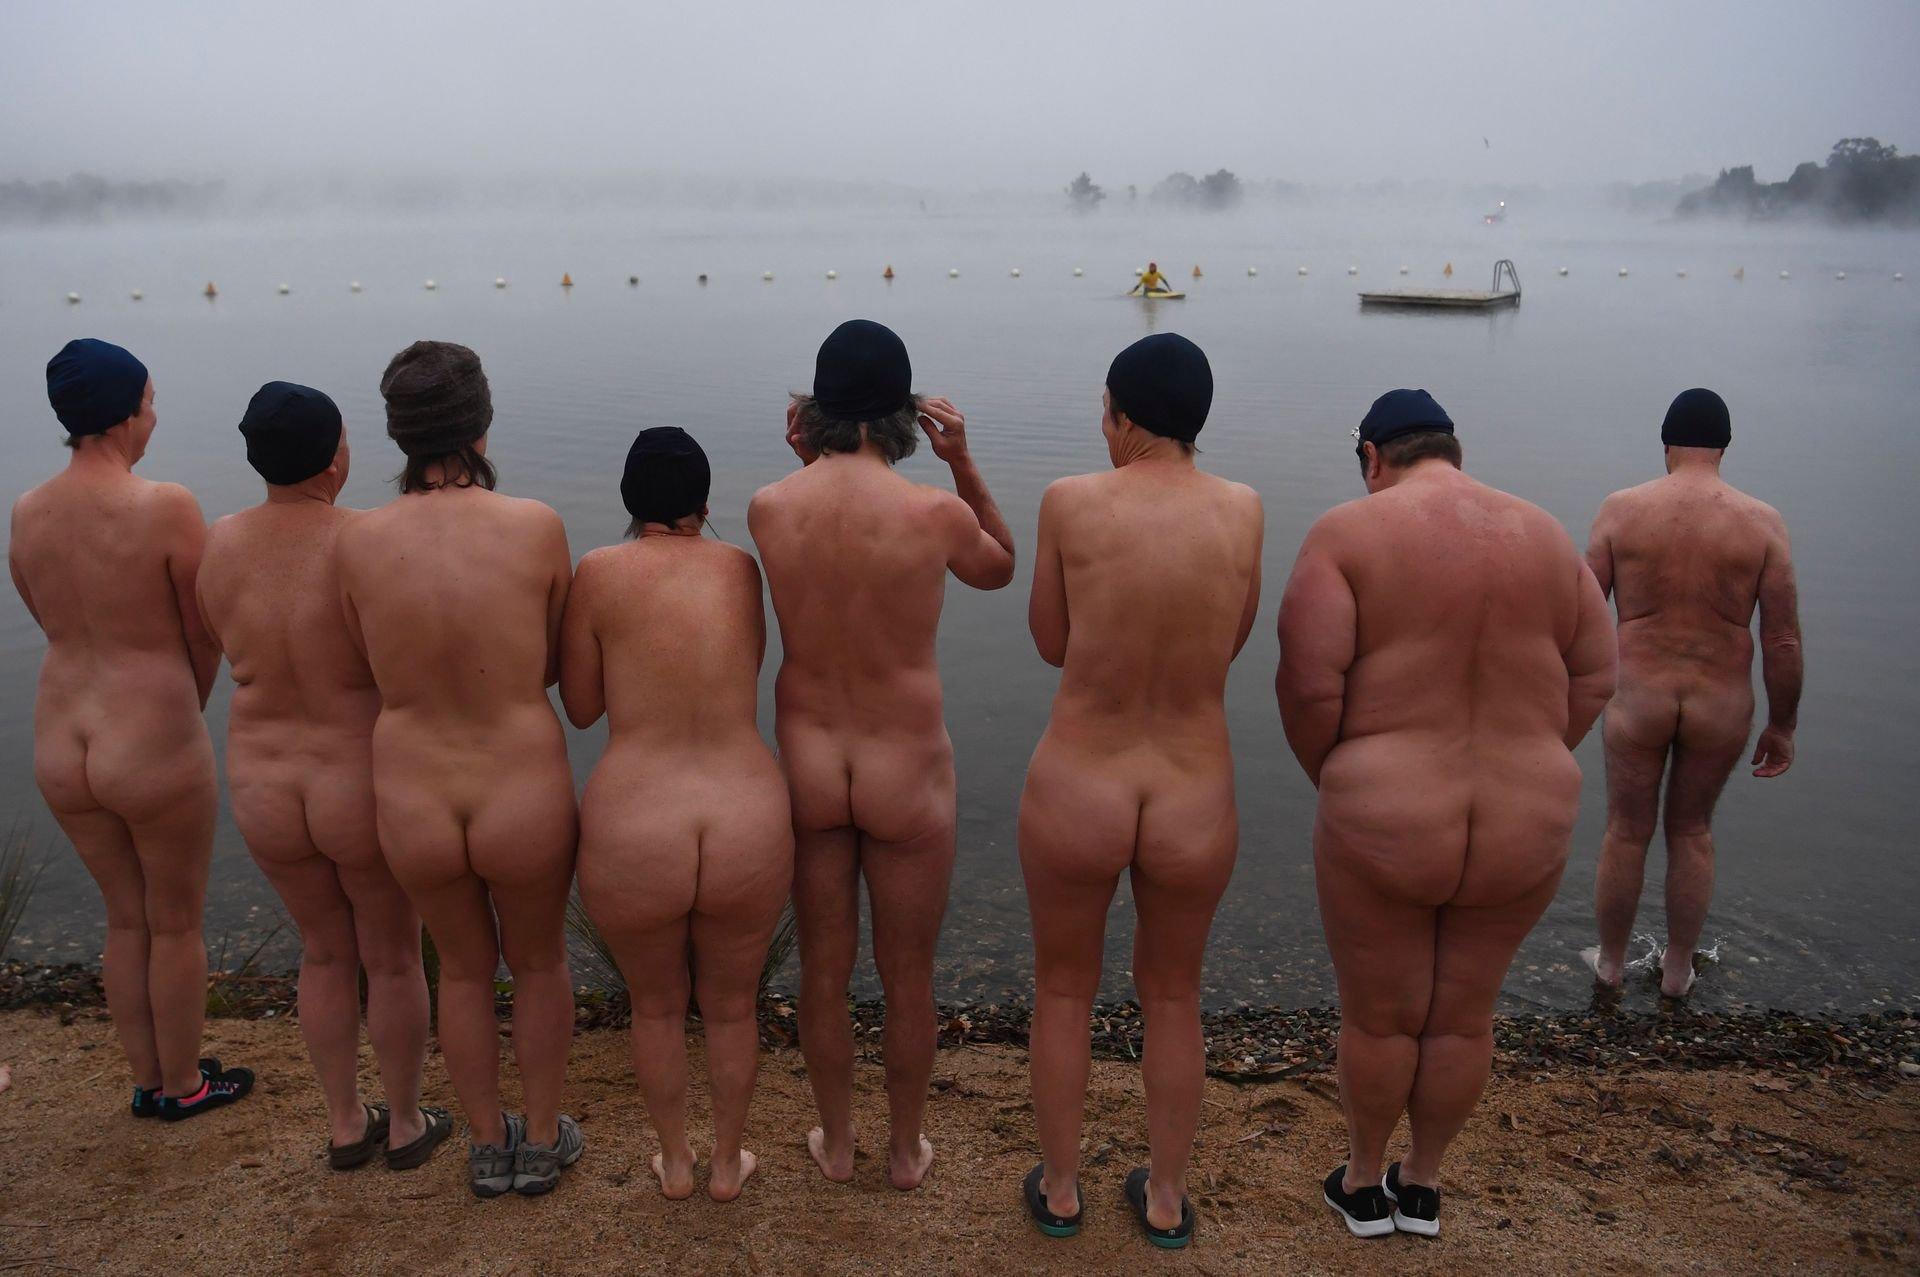 Dark Mofo Festival's Nude Swim Has Towel Shortage